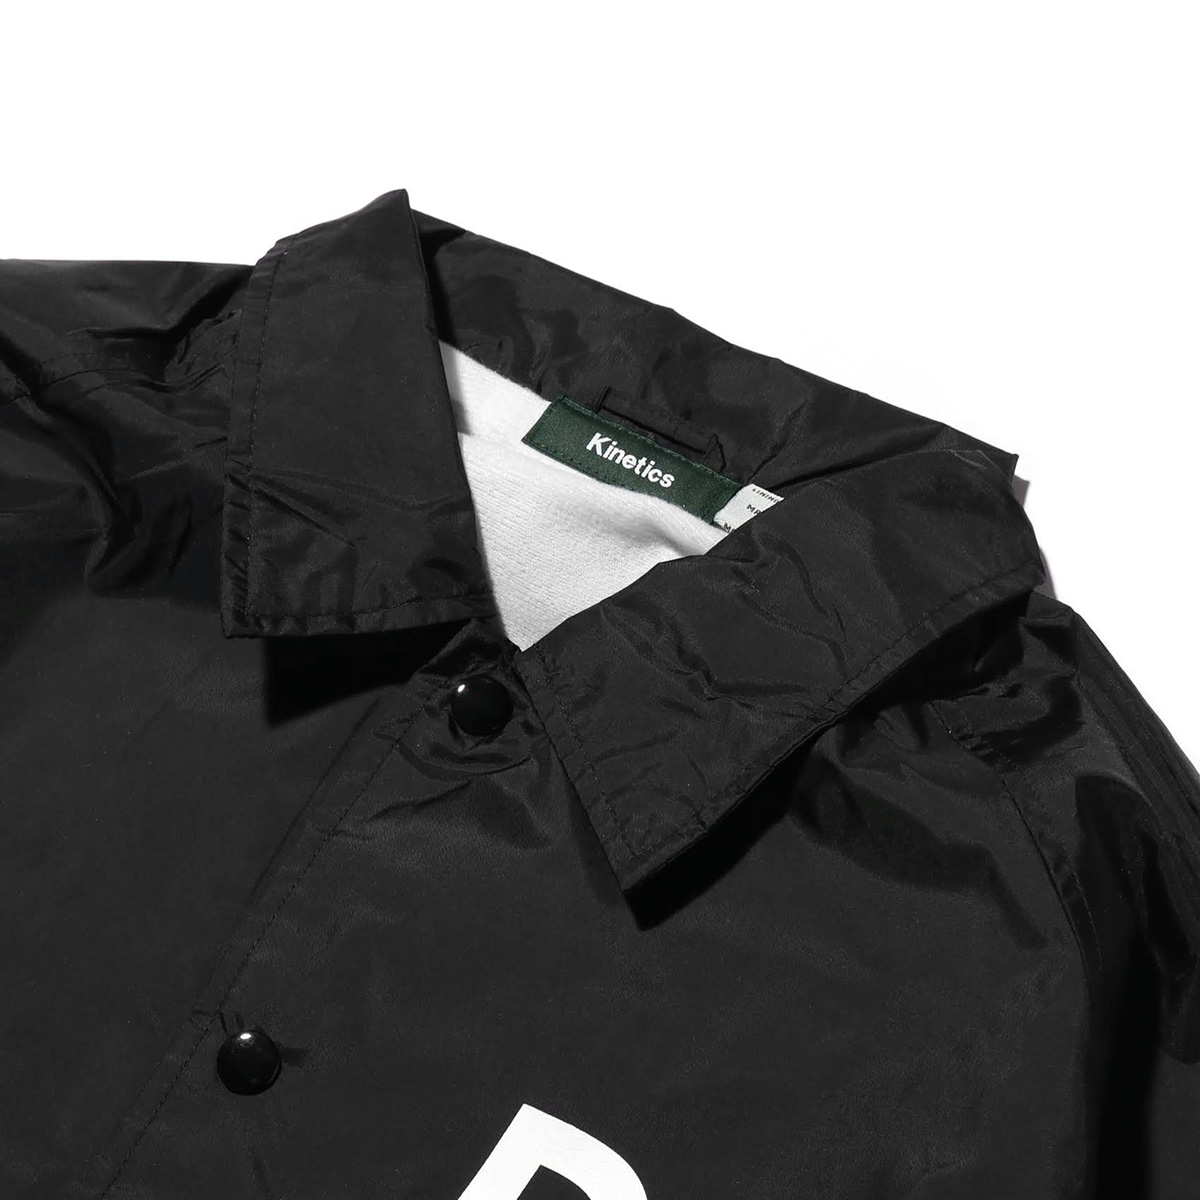 Kinetics Brain Coaches Jacket (kinetics brain coach jacket) (BLACK)